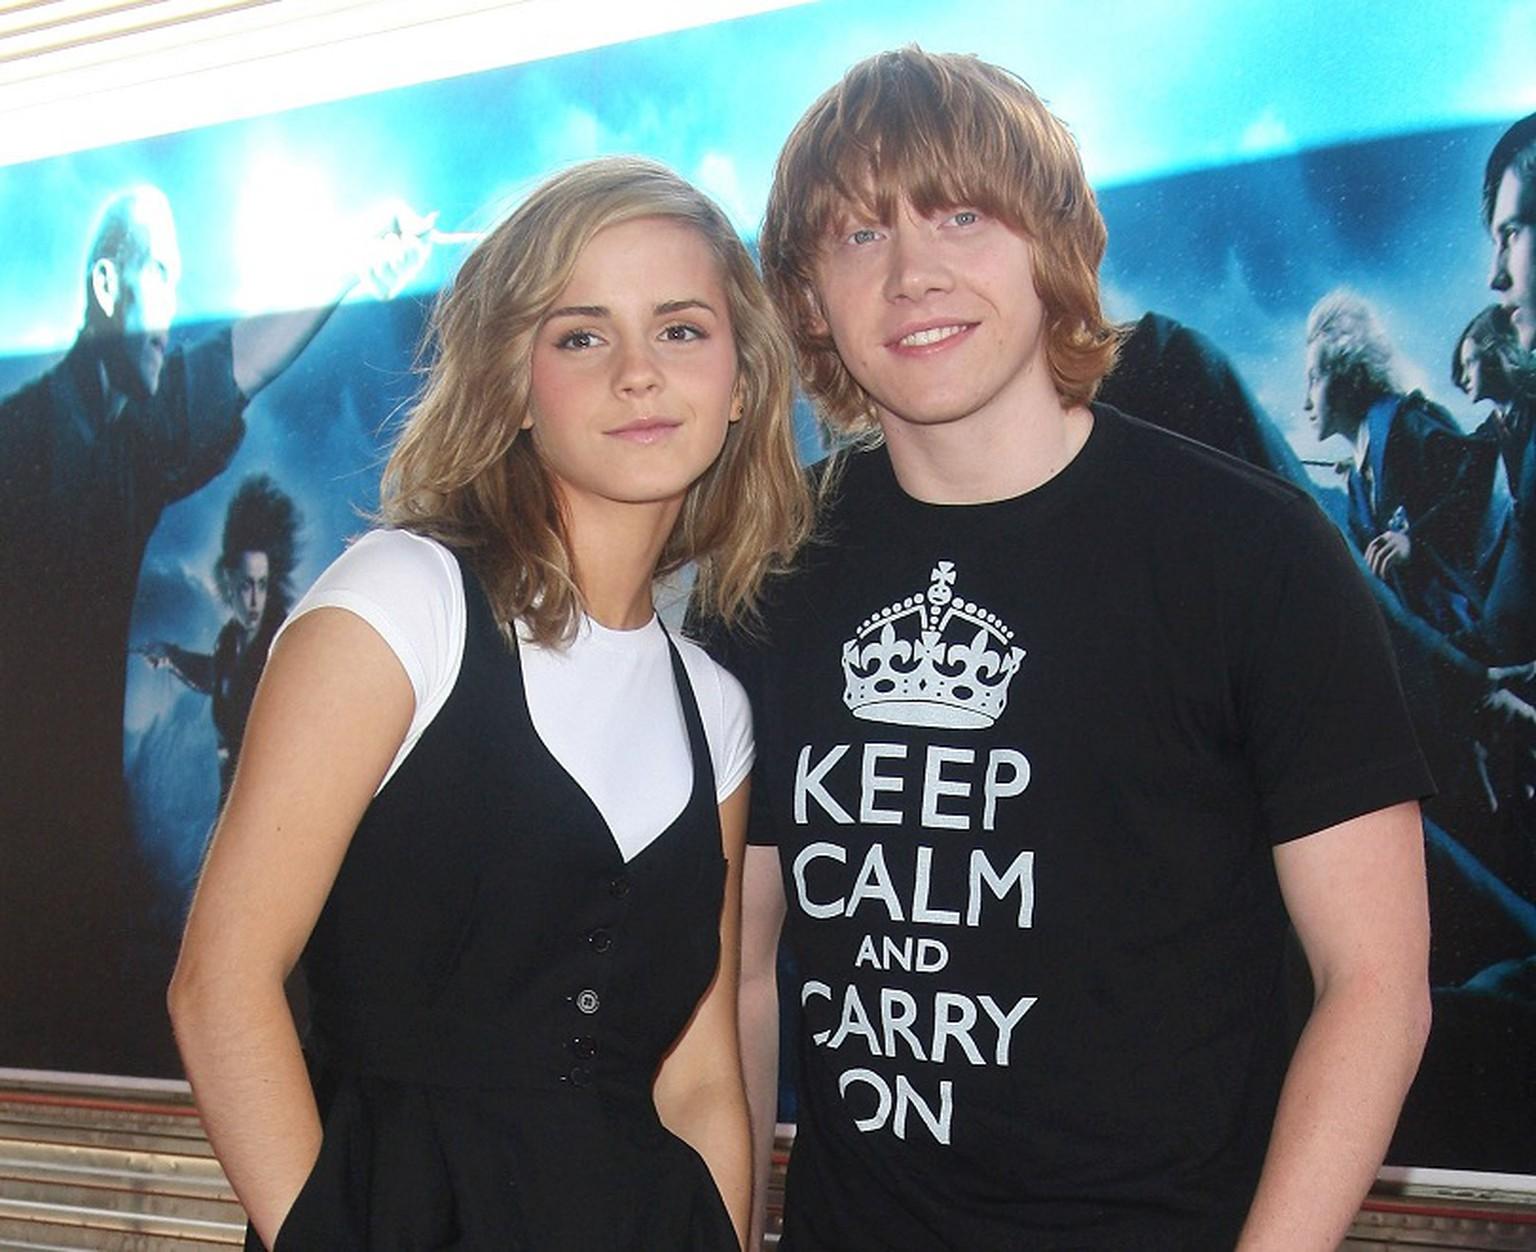 Harry Potter Ron Weasley Verrat Mit Wem Emma Watson Am Set Anbandelte Watson